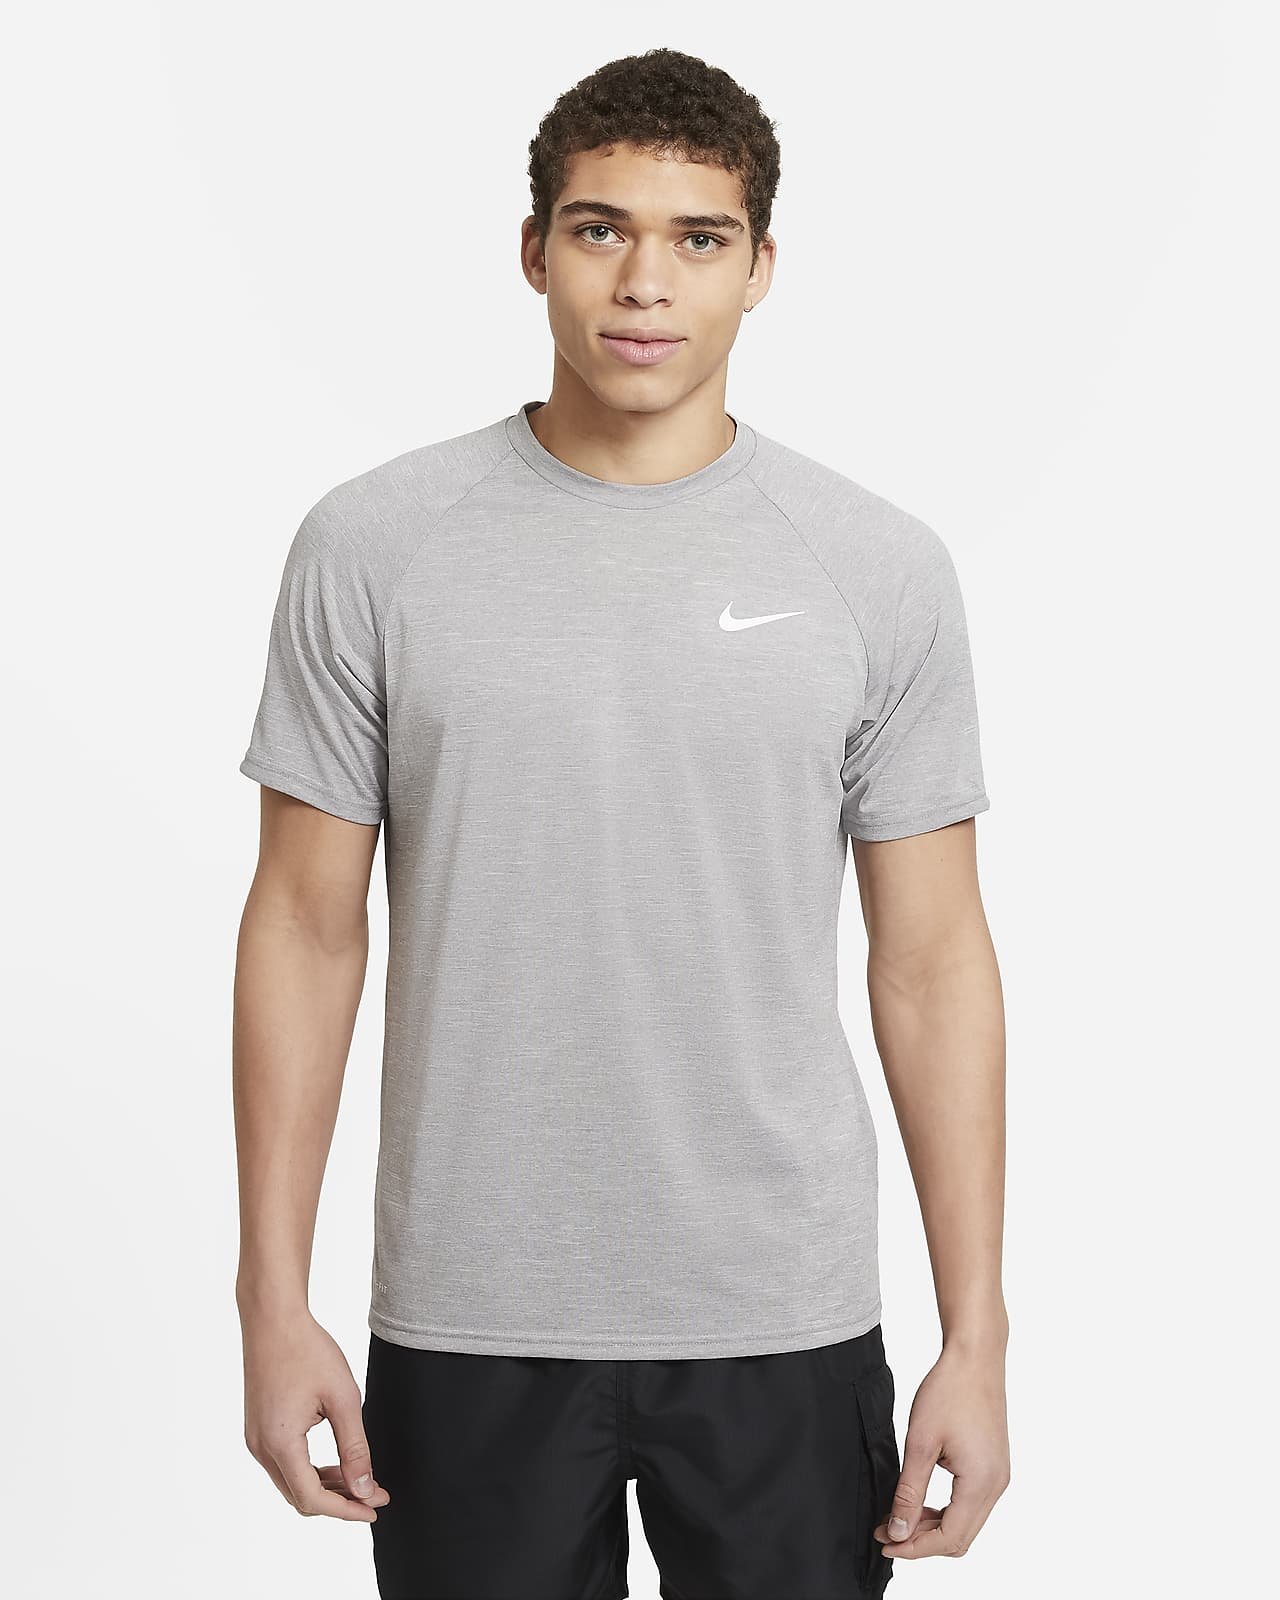 Nike Men's Heathered Short-Sleeve Hydroguard Swim Shirt